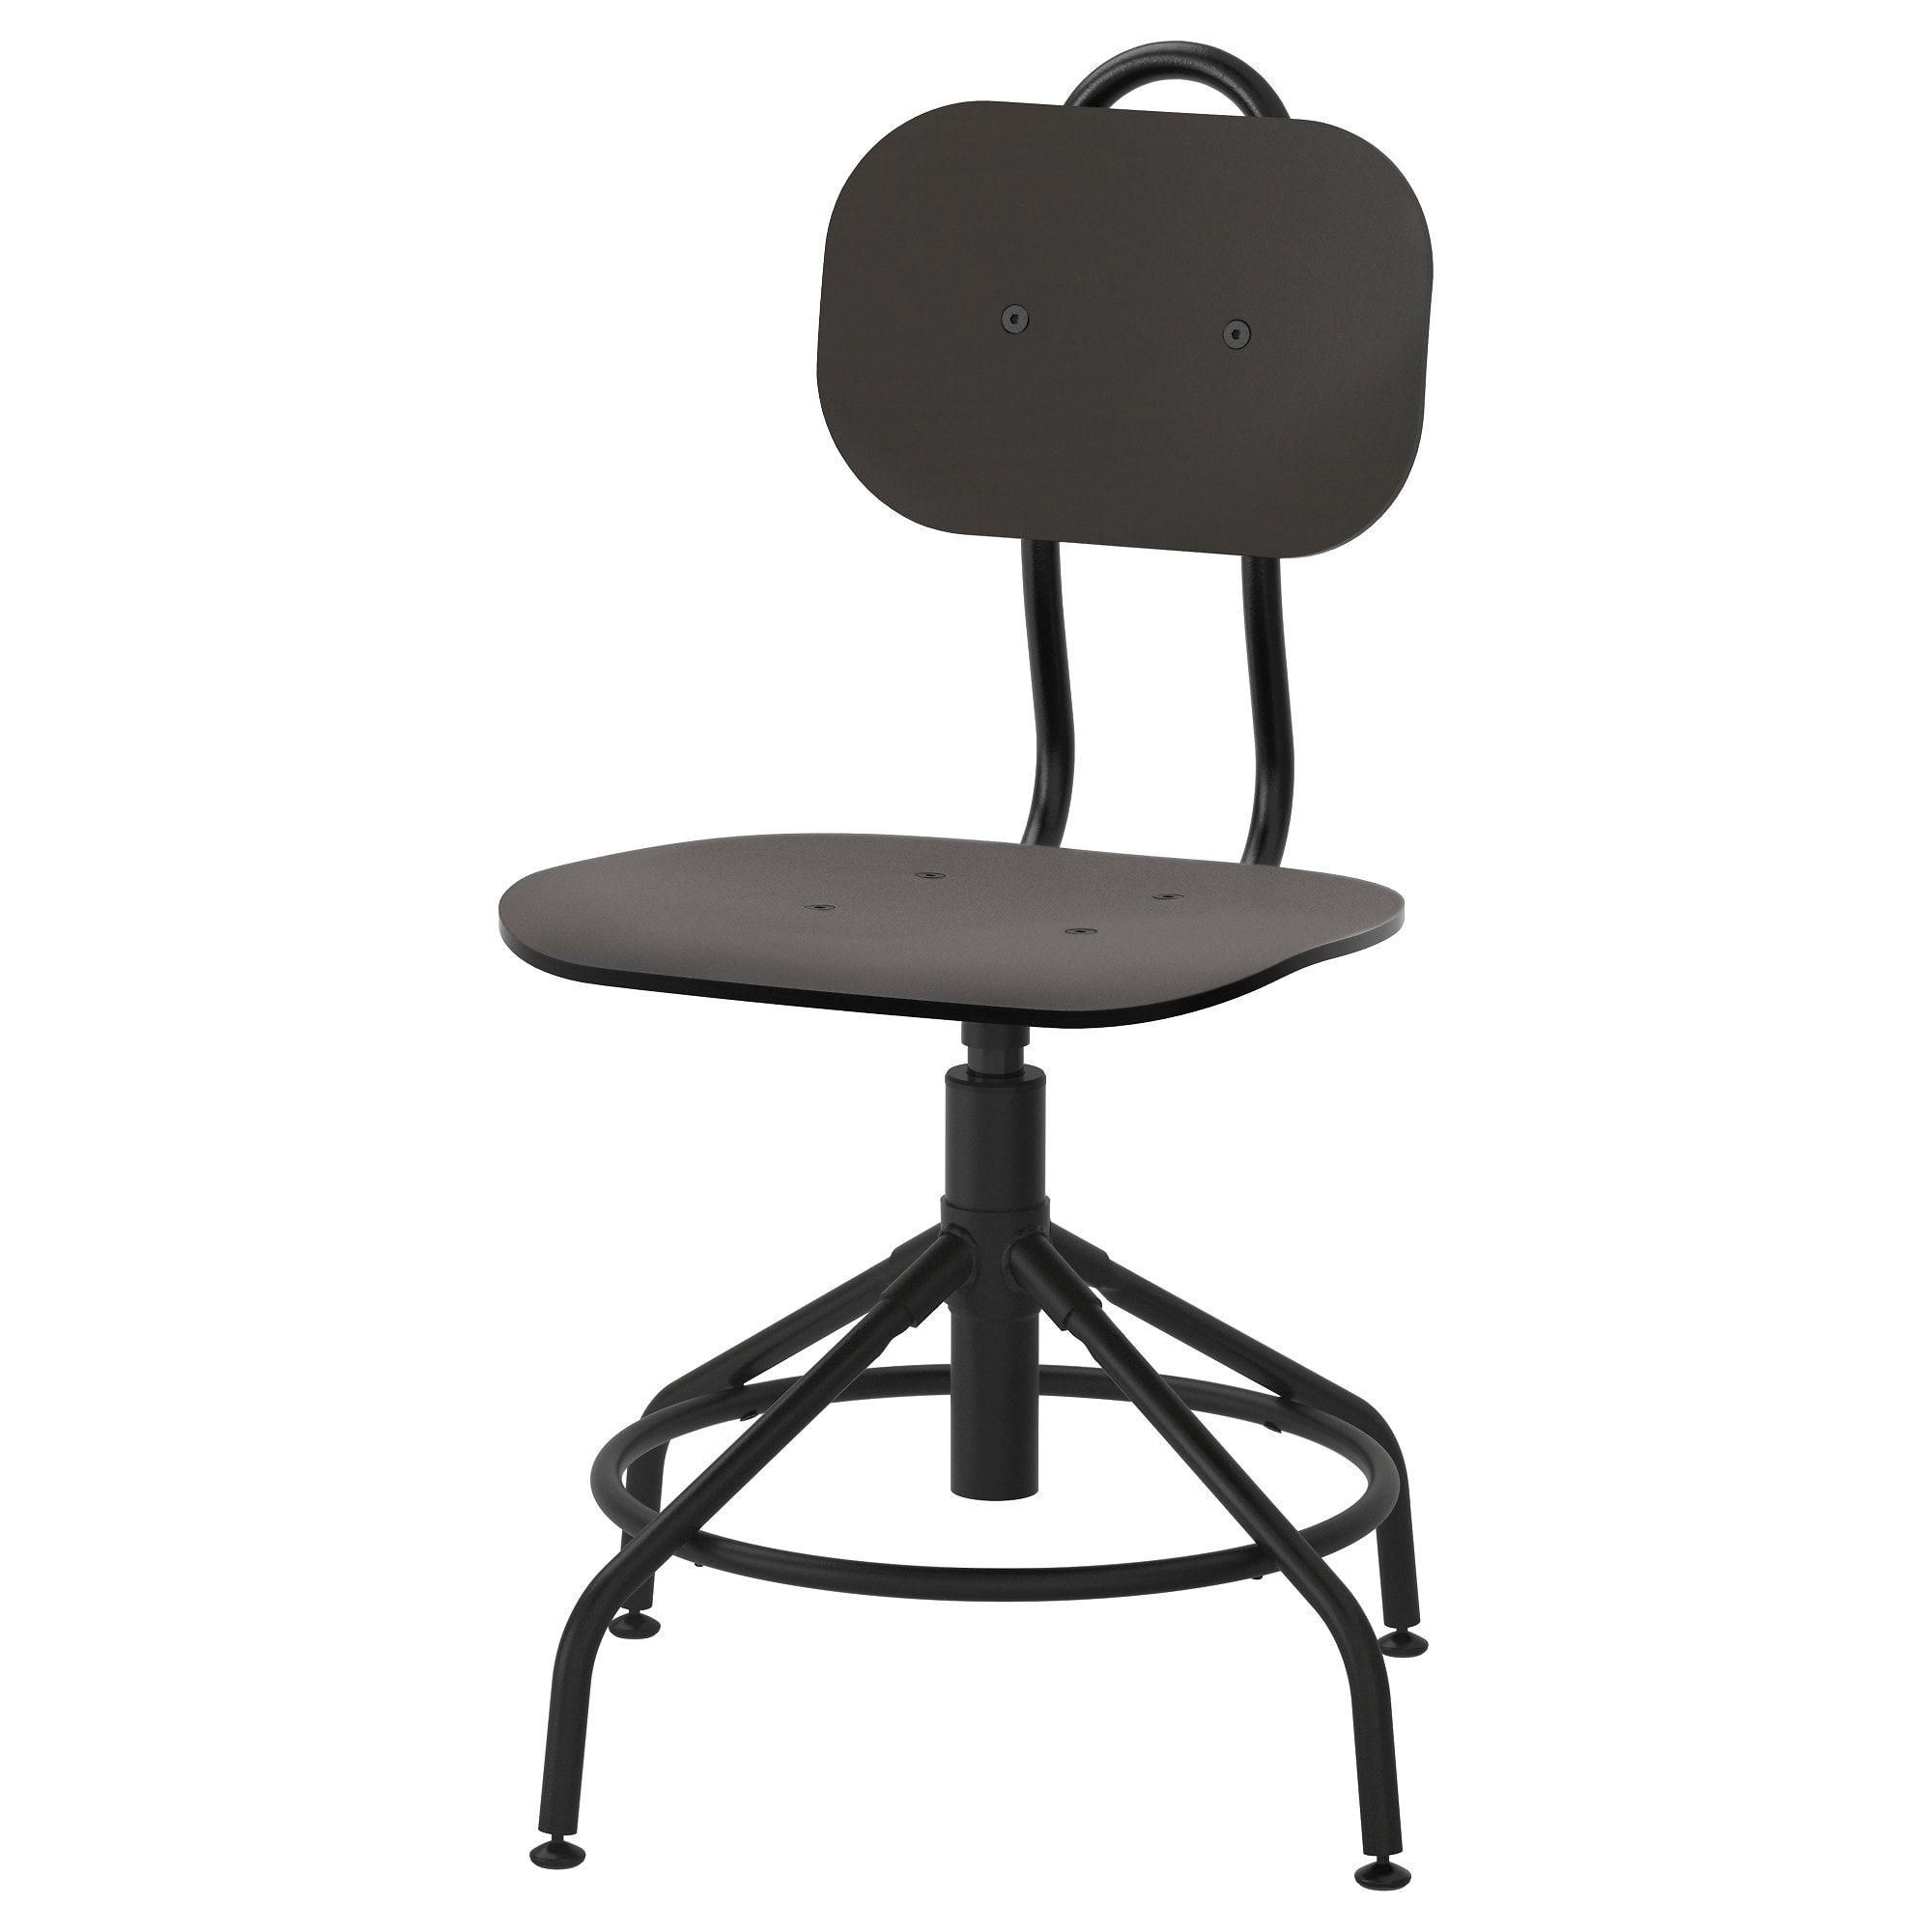 KULLABERG Swivel chair black IKEA Desk chair comfy